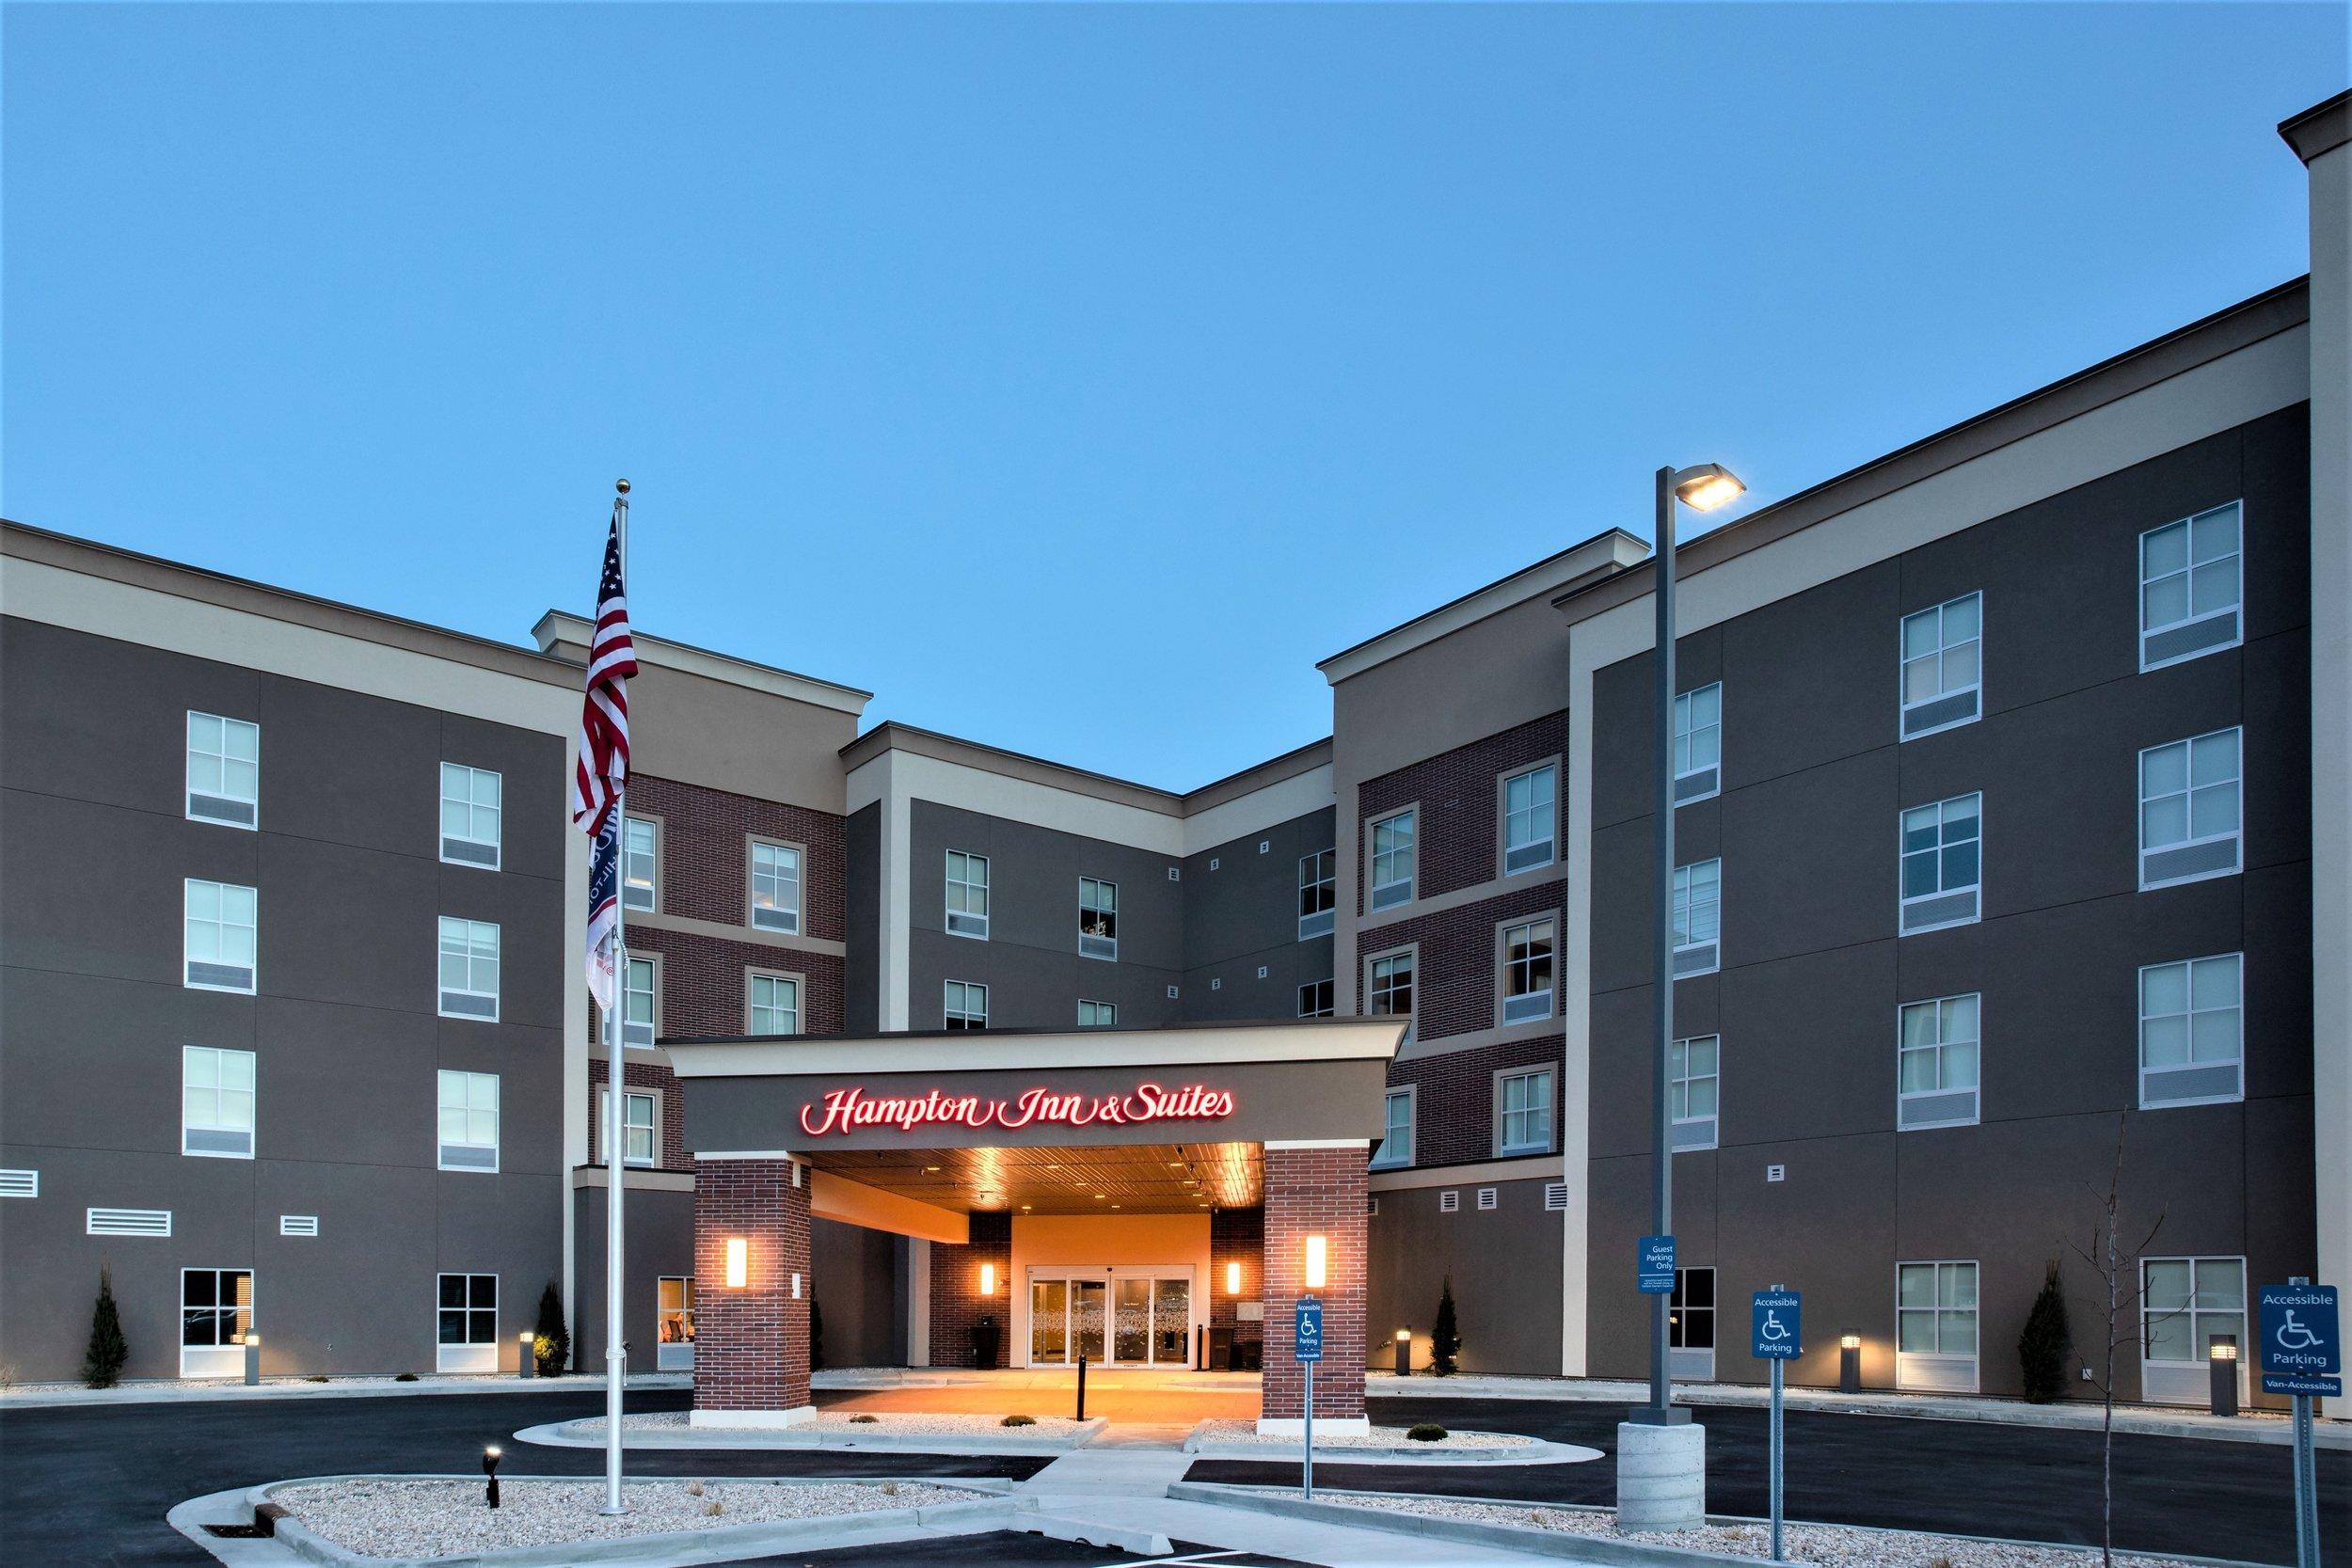 Hampton Inn & Suites-Logan - 207 North Main Logan, UT 84321ph: (435) 753-3000Single Queen = $109Double Queen = $114Book here.